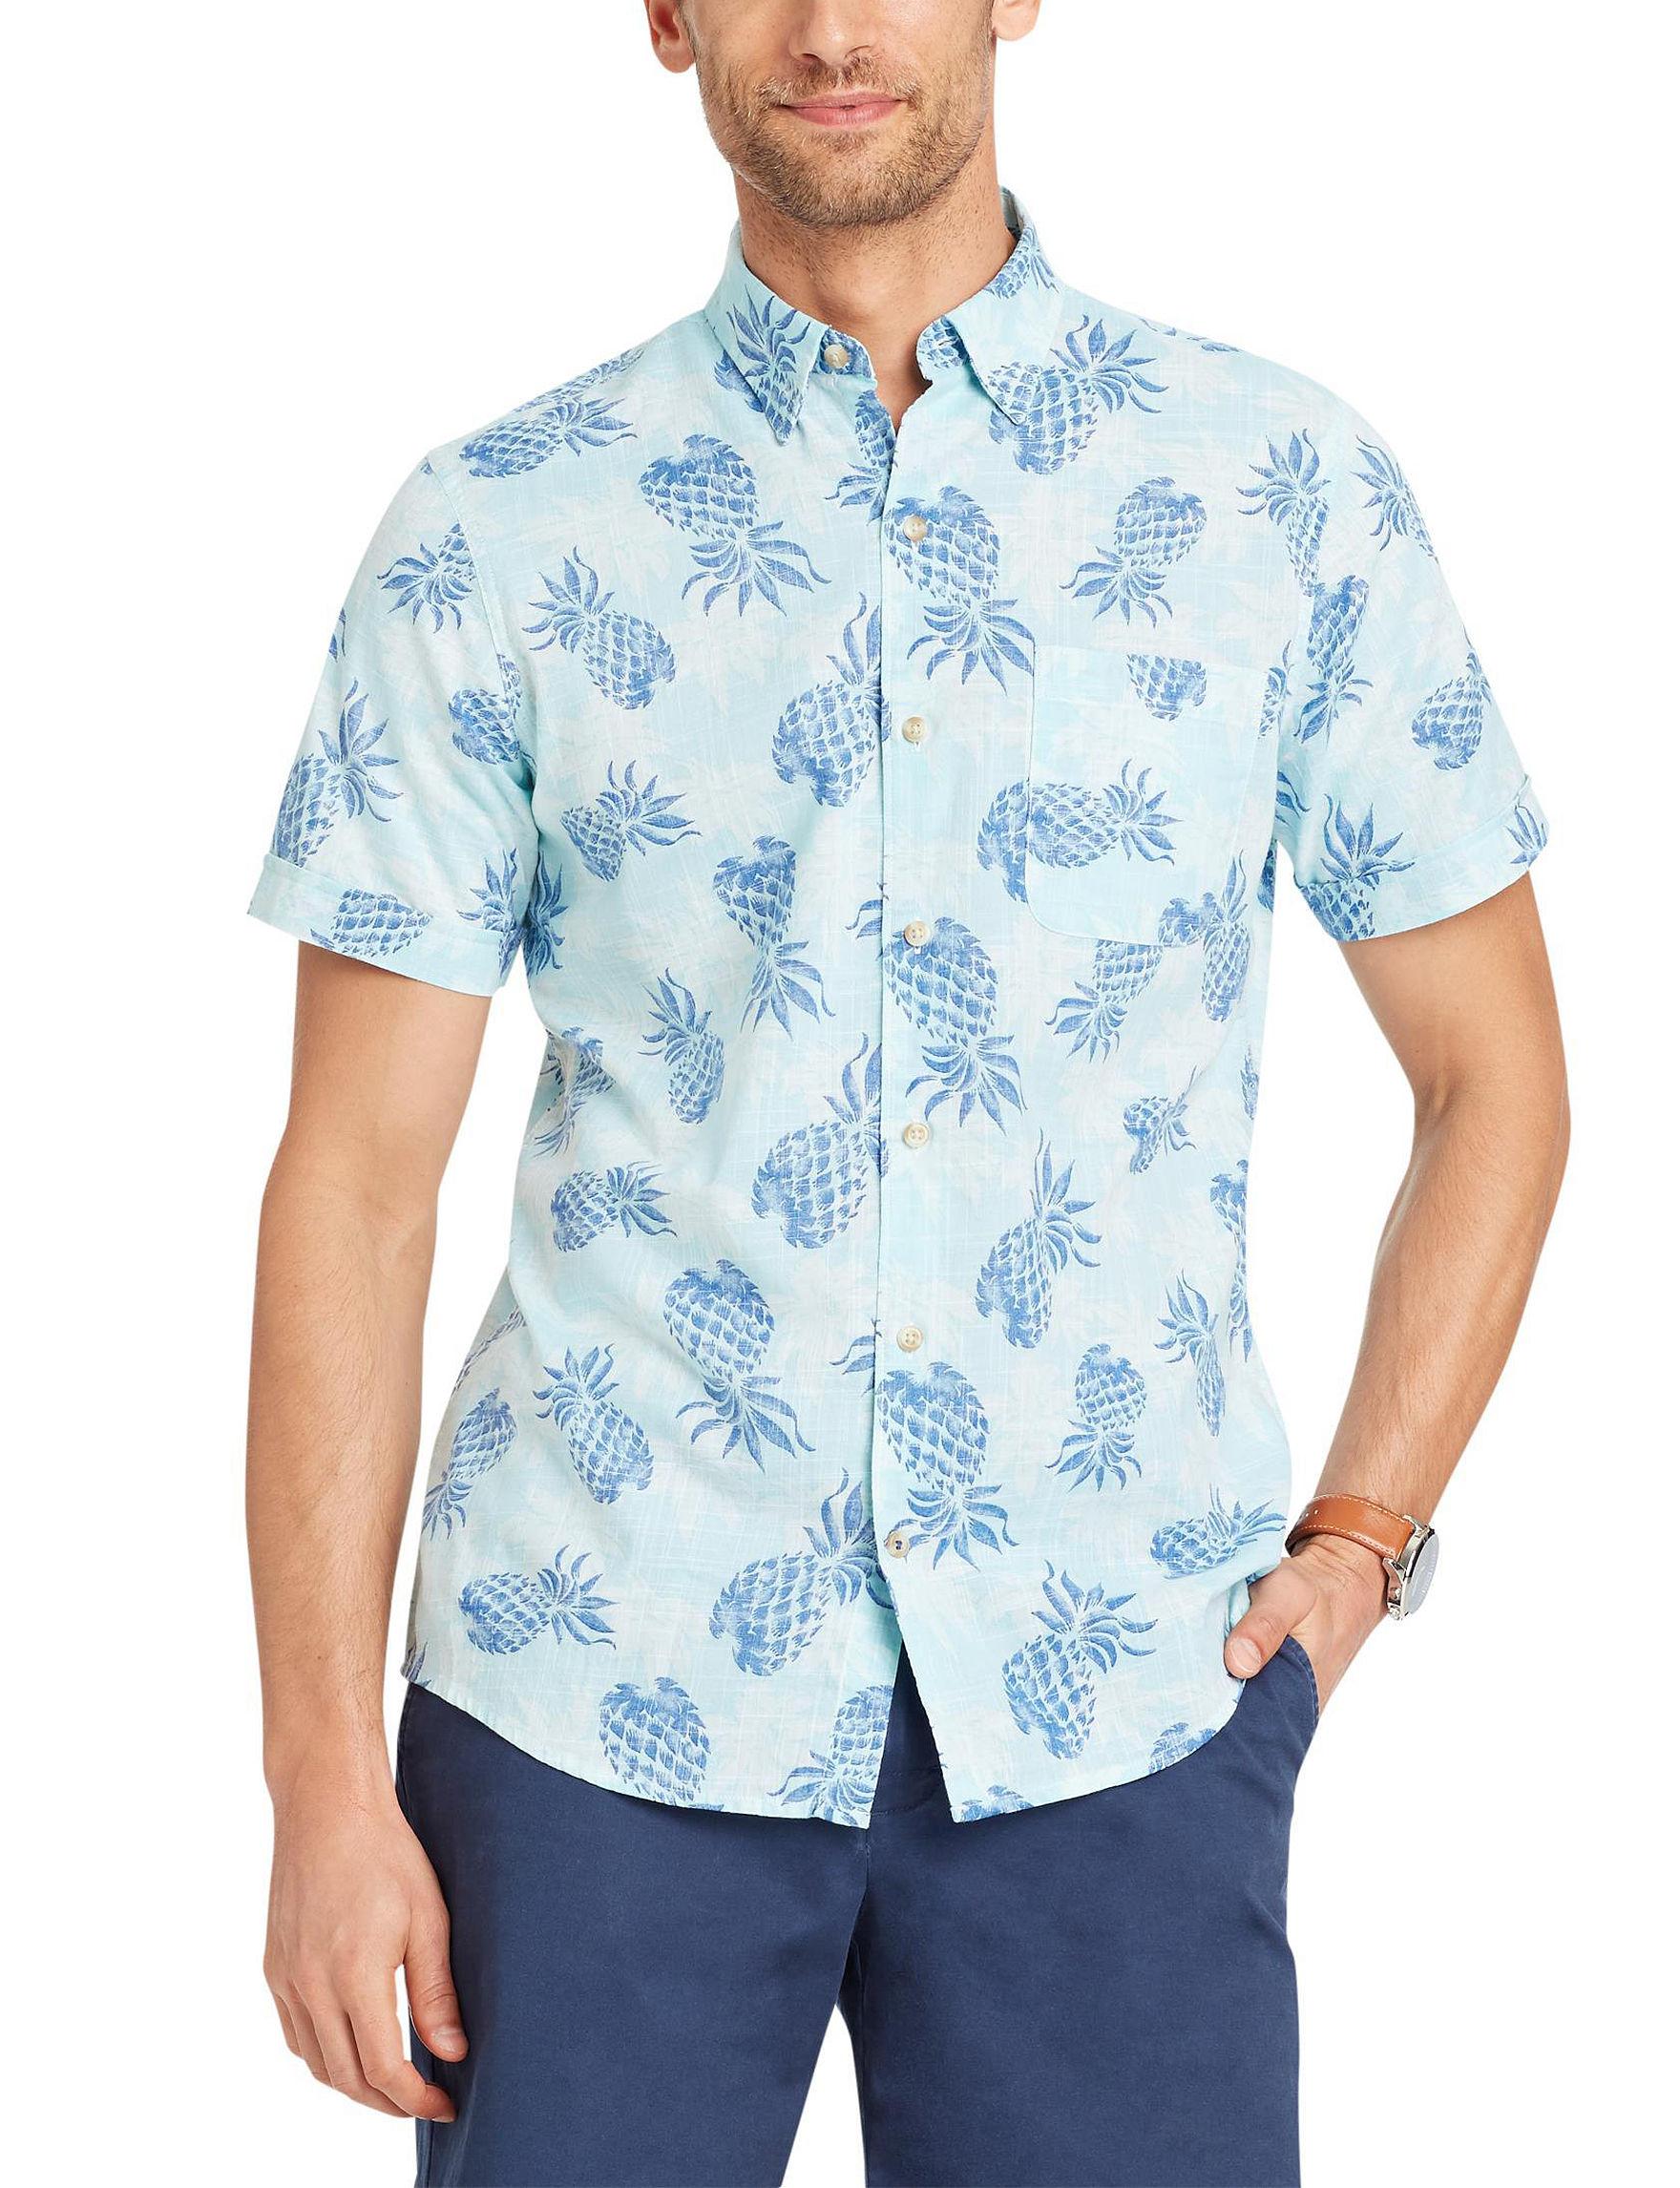 Izod Light Blue Casual Button Down Shirts